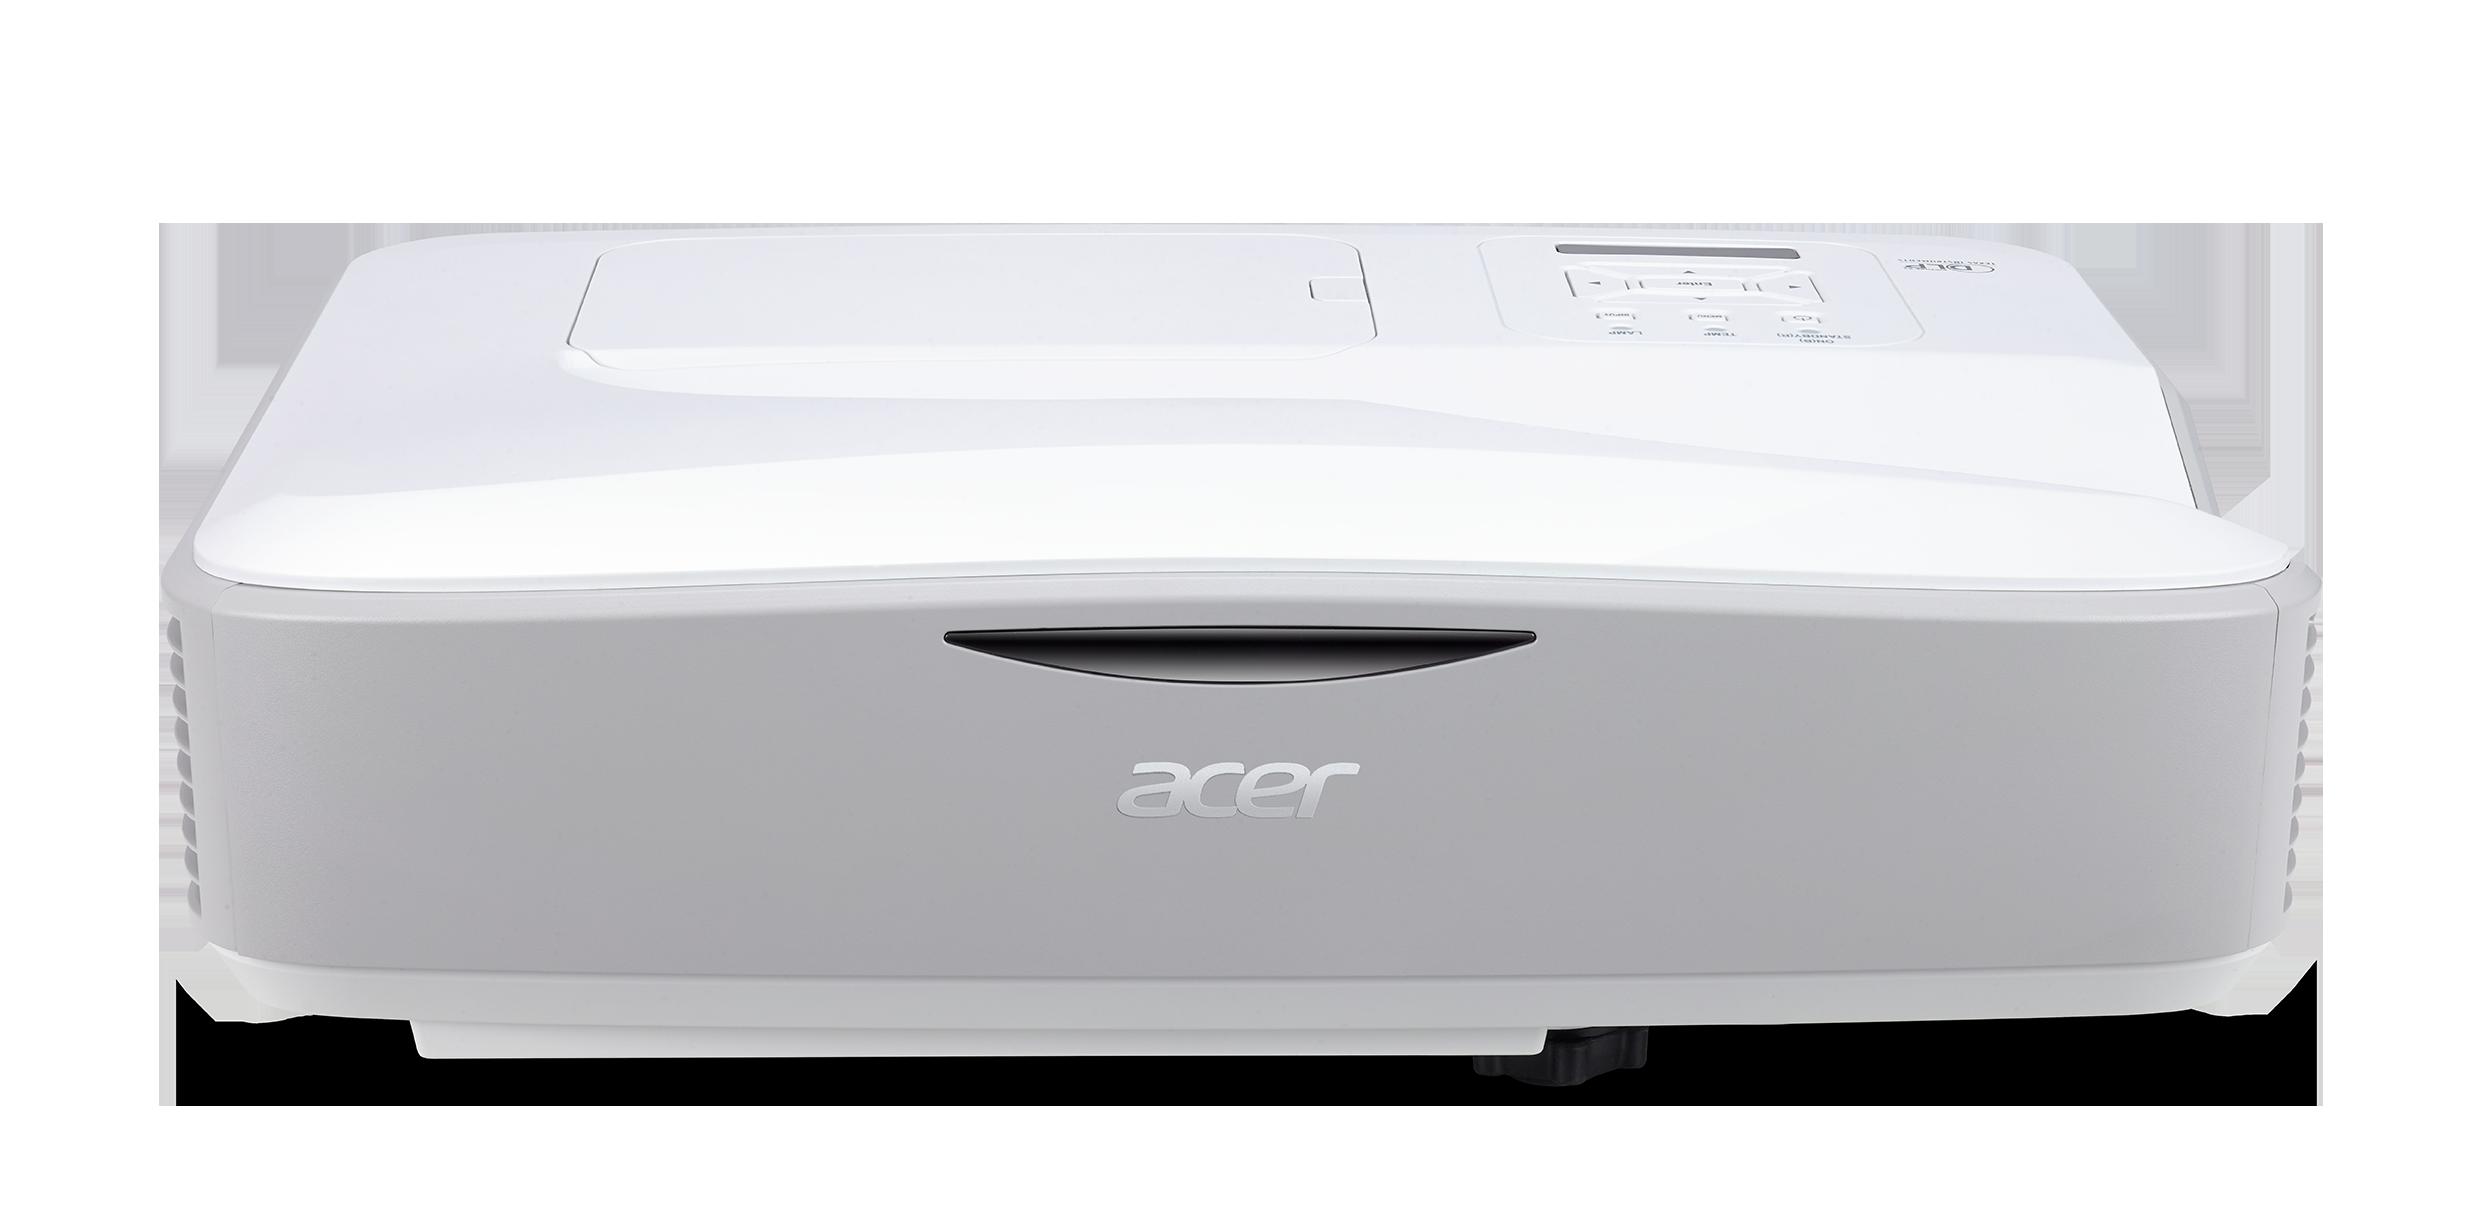 Acer U5230 DLP/3D/1024x768 XGA/3200 ANSI/18000:1/VGA,2xHDMI,USB,RJ45/repro 1x16W/4,6 Kg/Ultra Short Throw